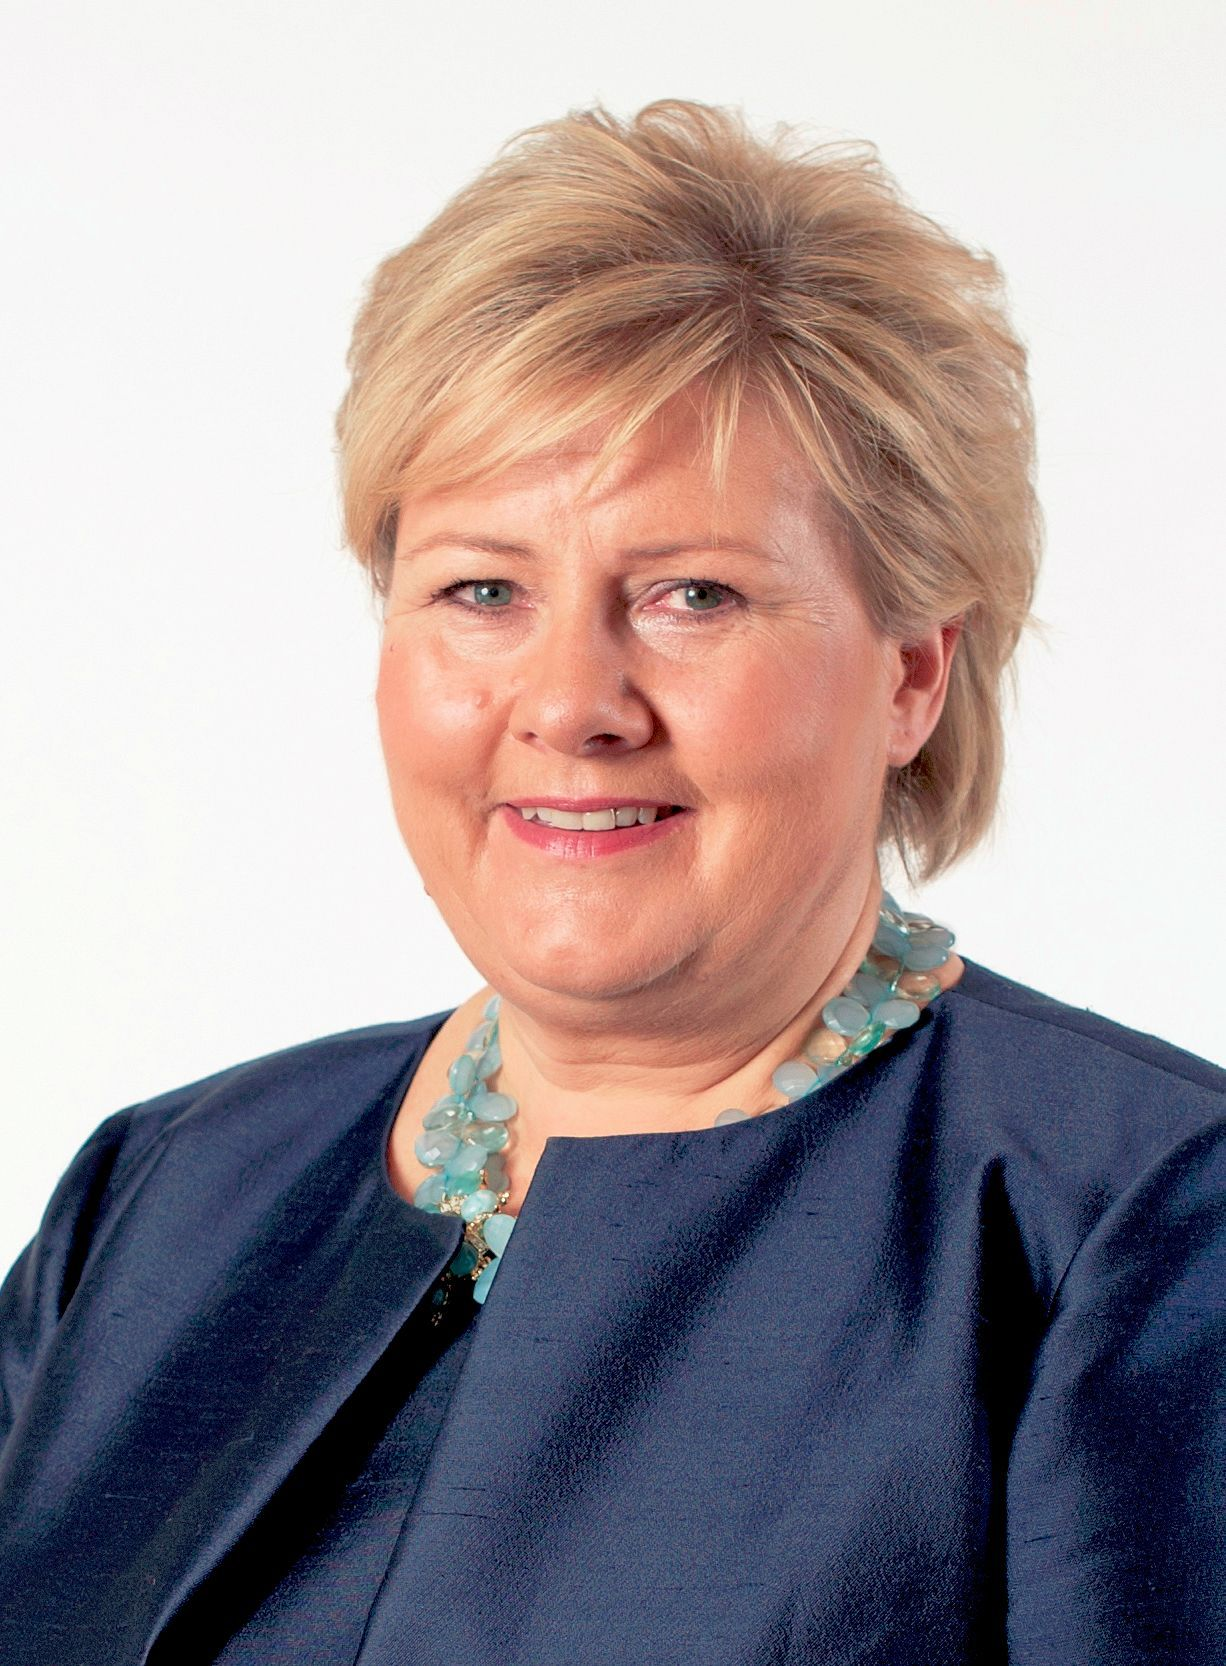 Erna Solberg Prime Minister Of Norway